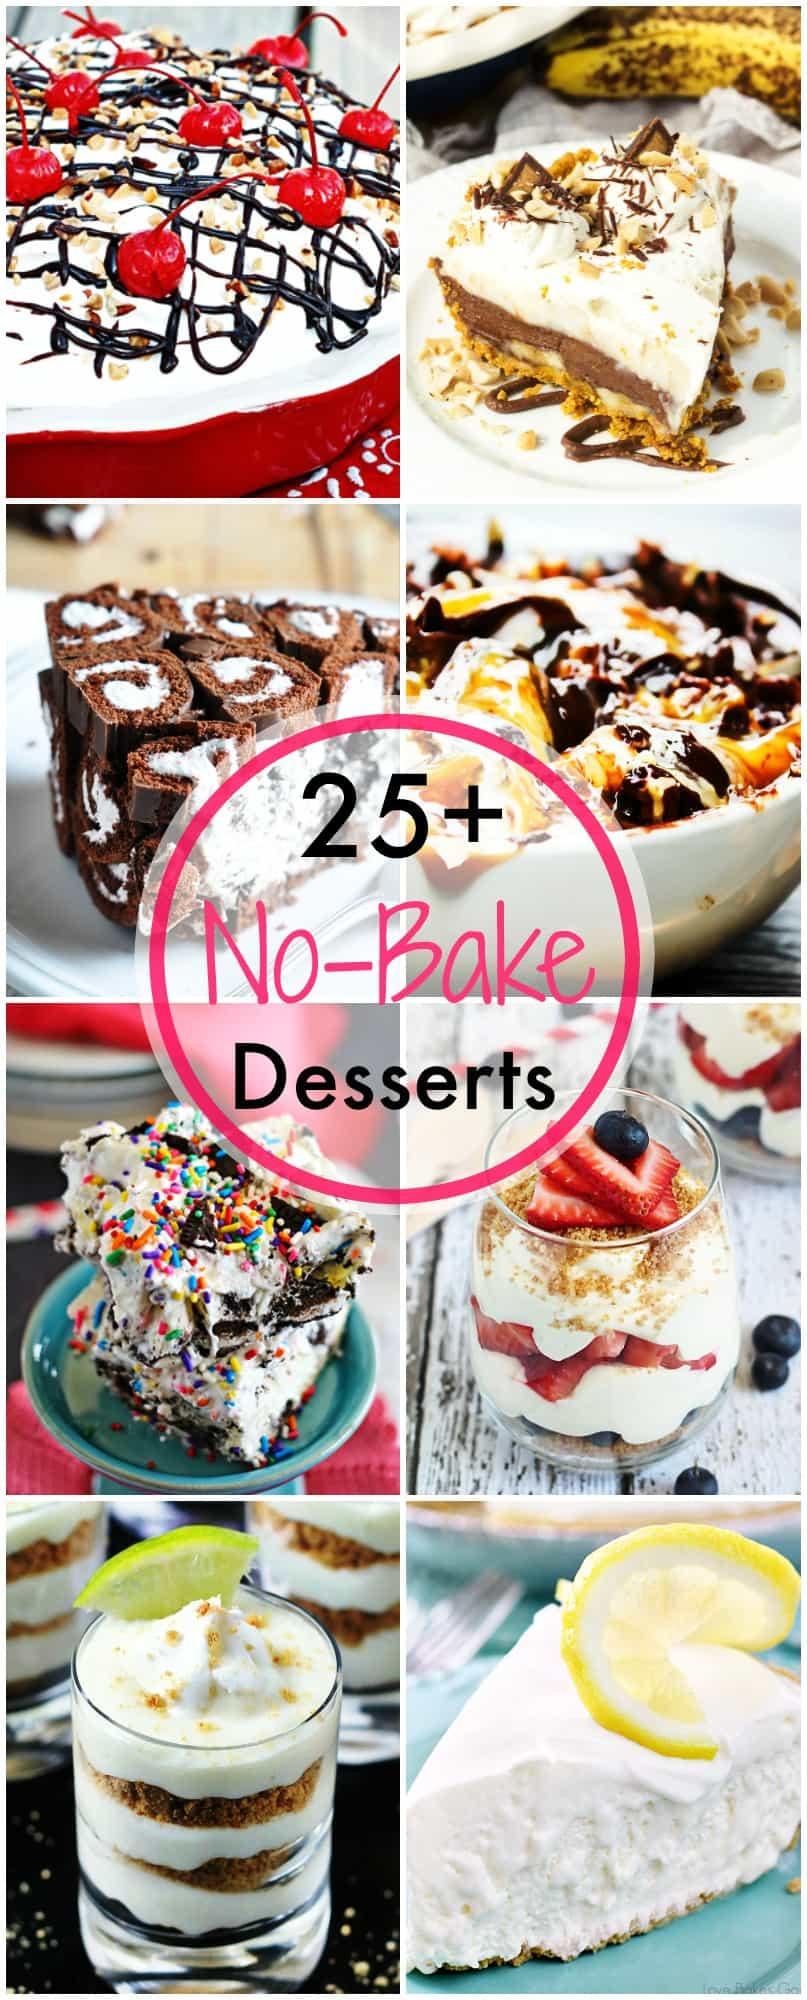 Summer Desserts No Bake  25 No Bake Dessert Recipes